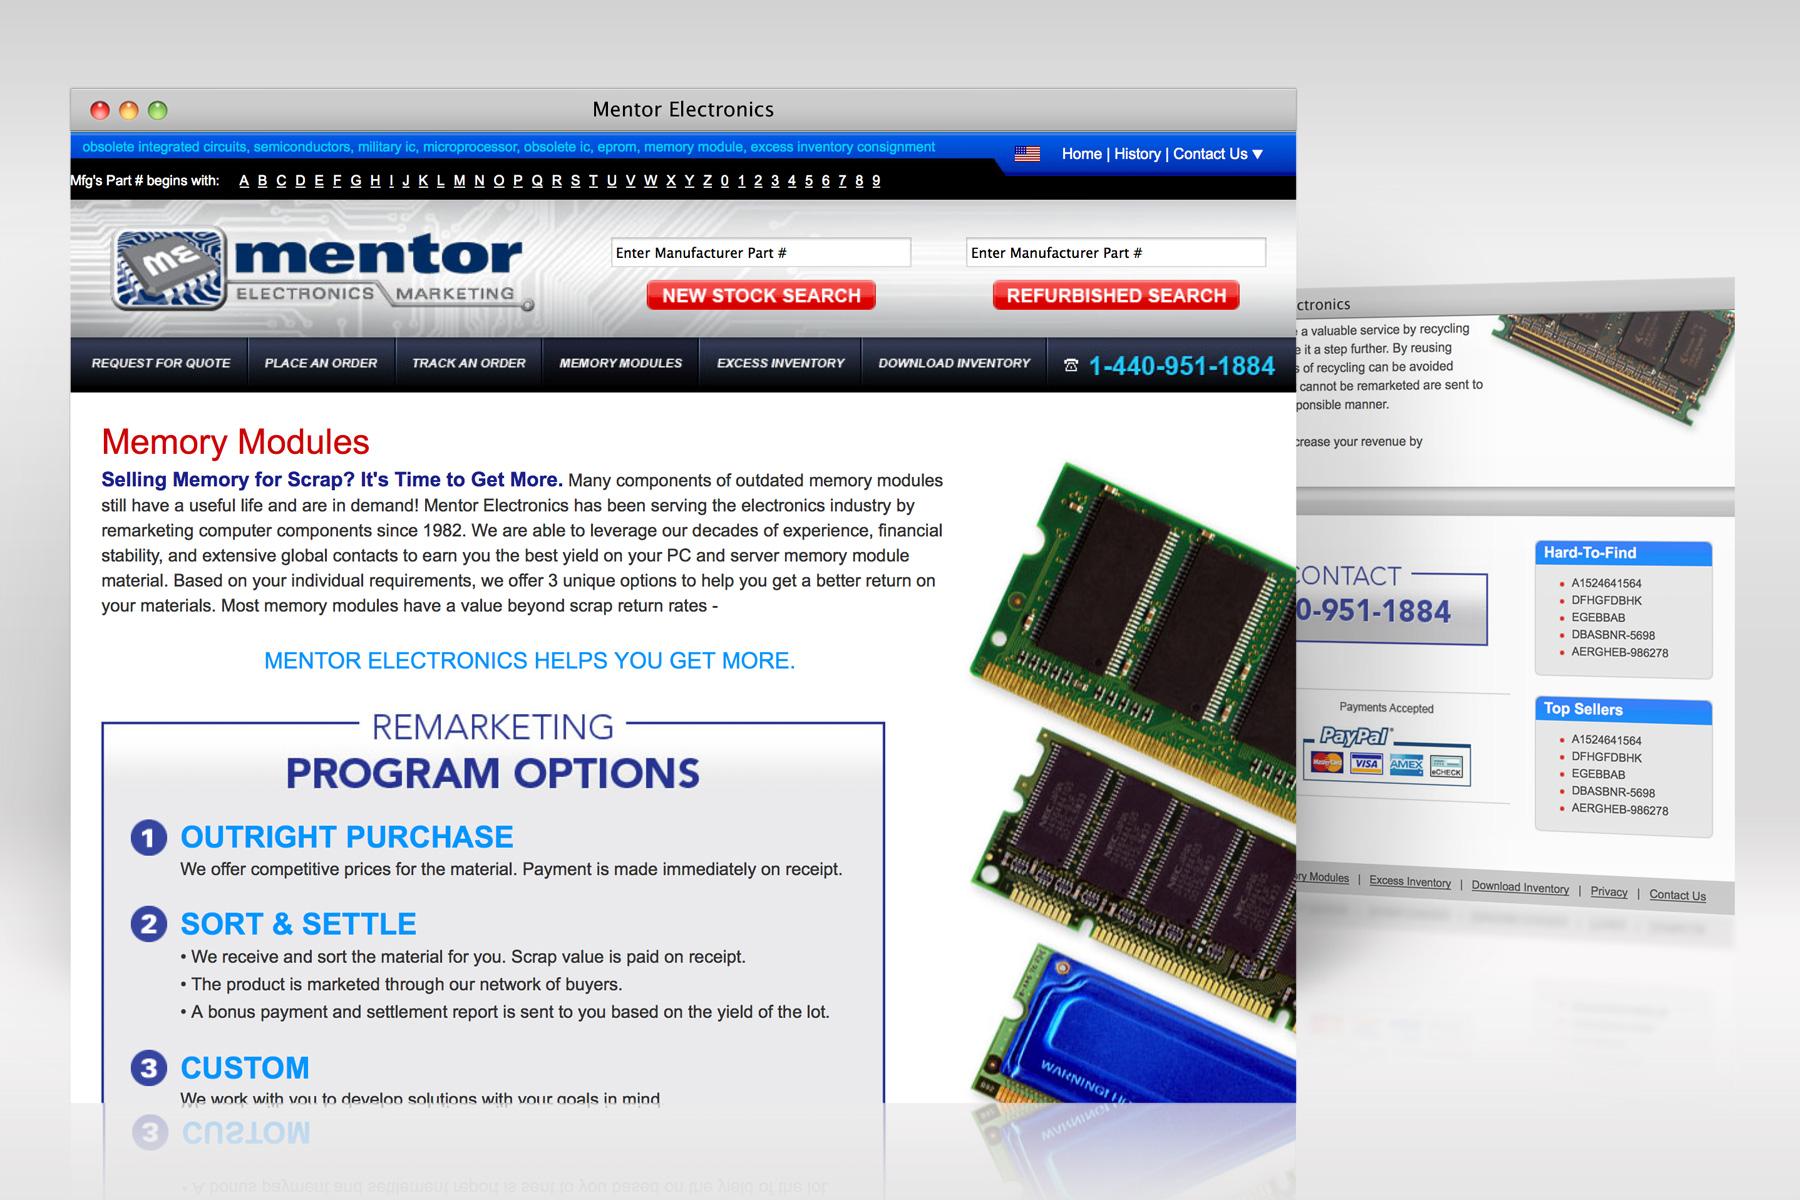 Mentor Electronics web design 2